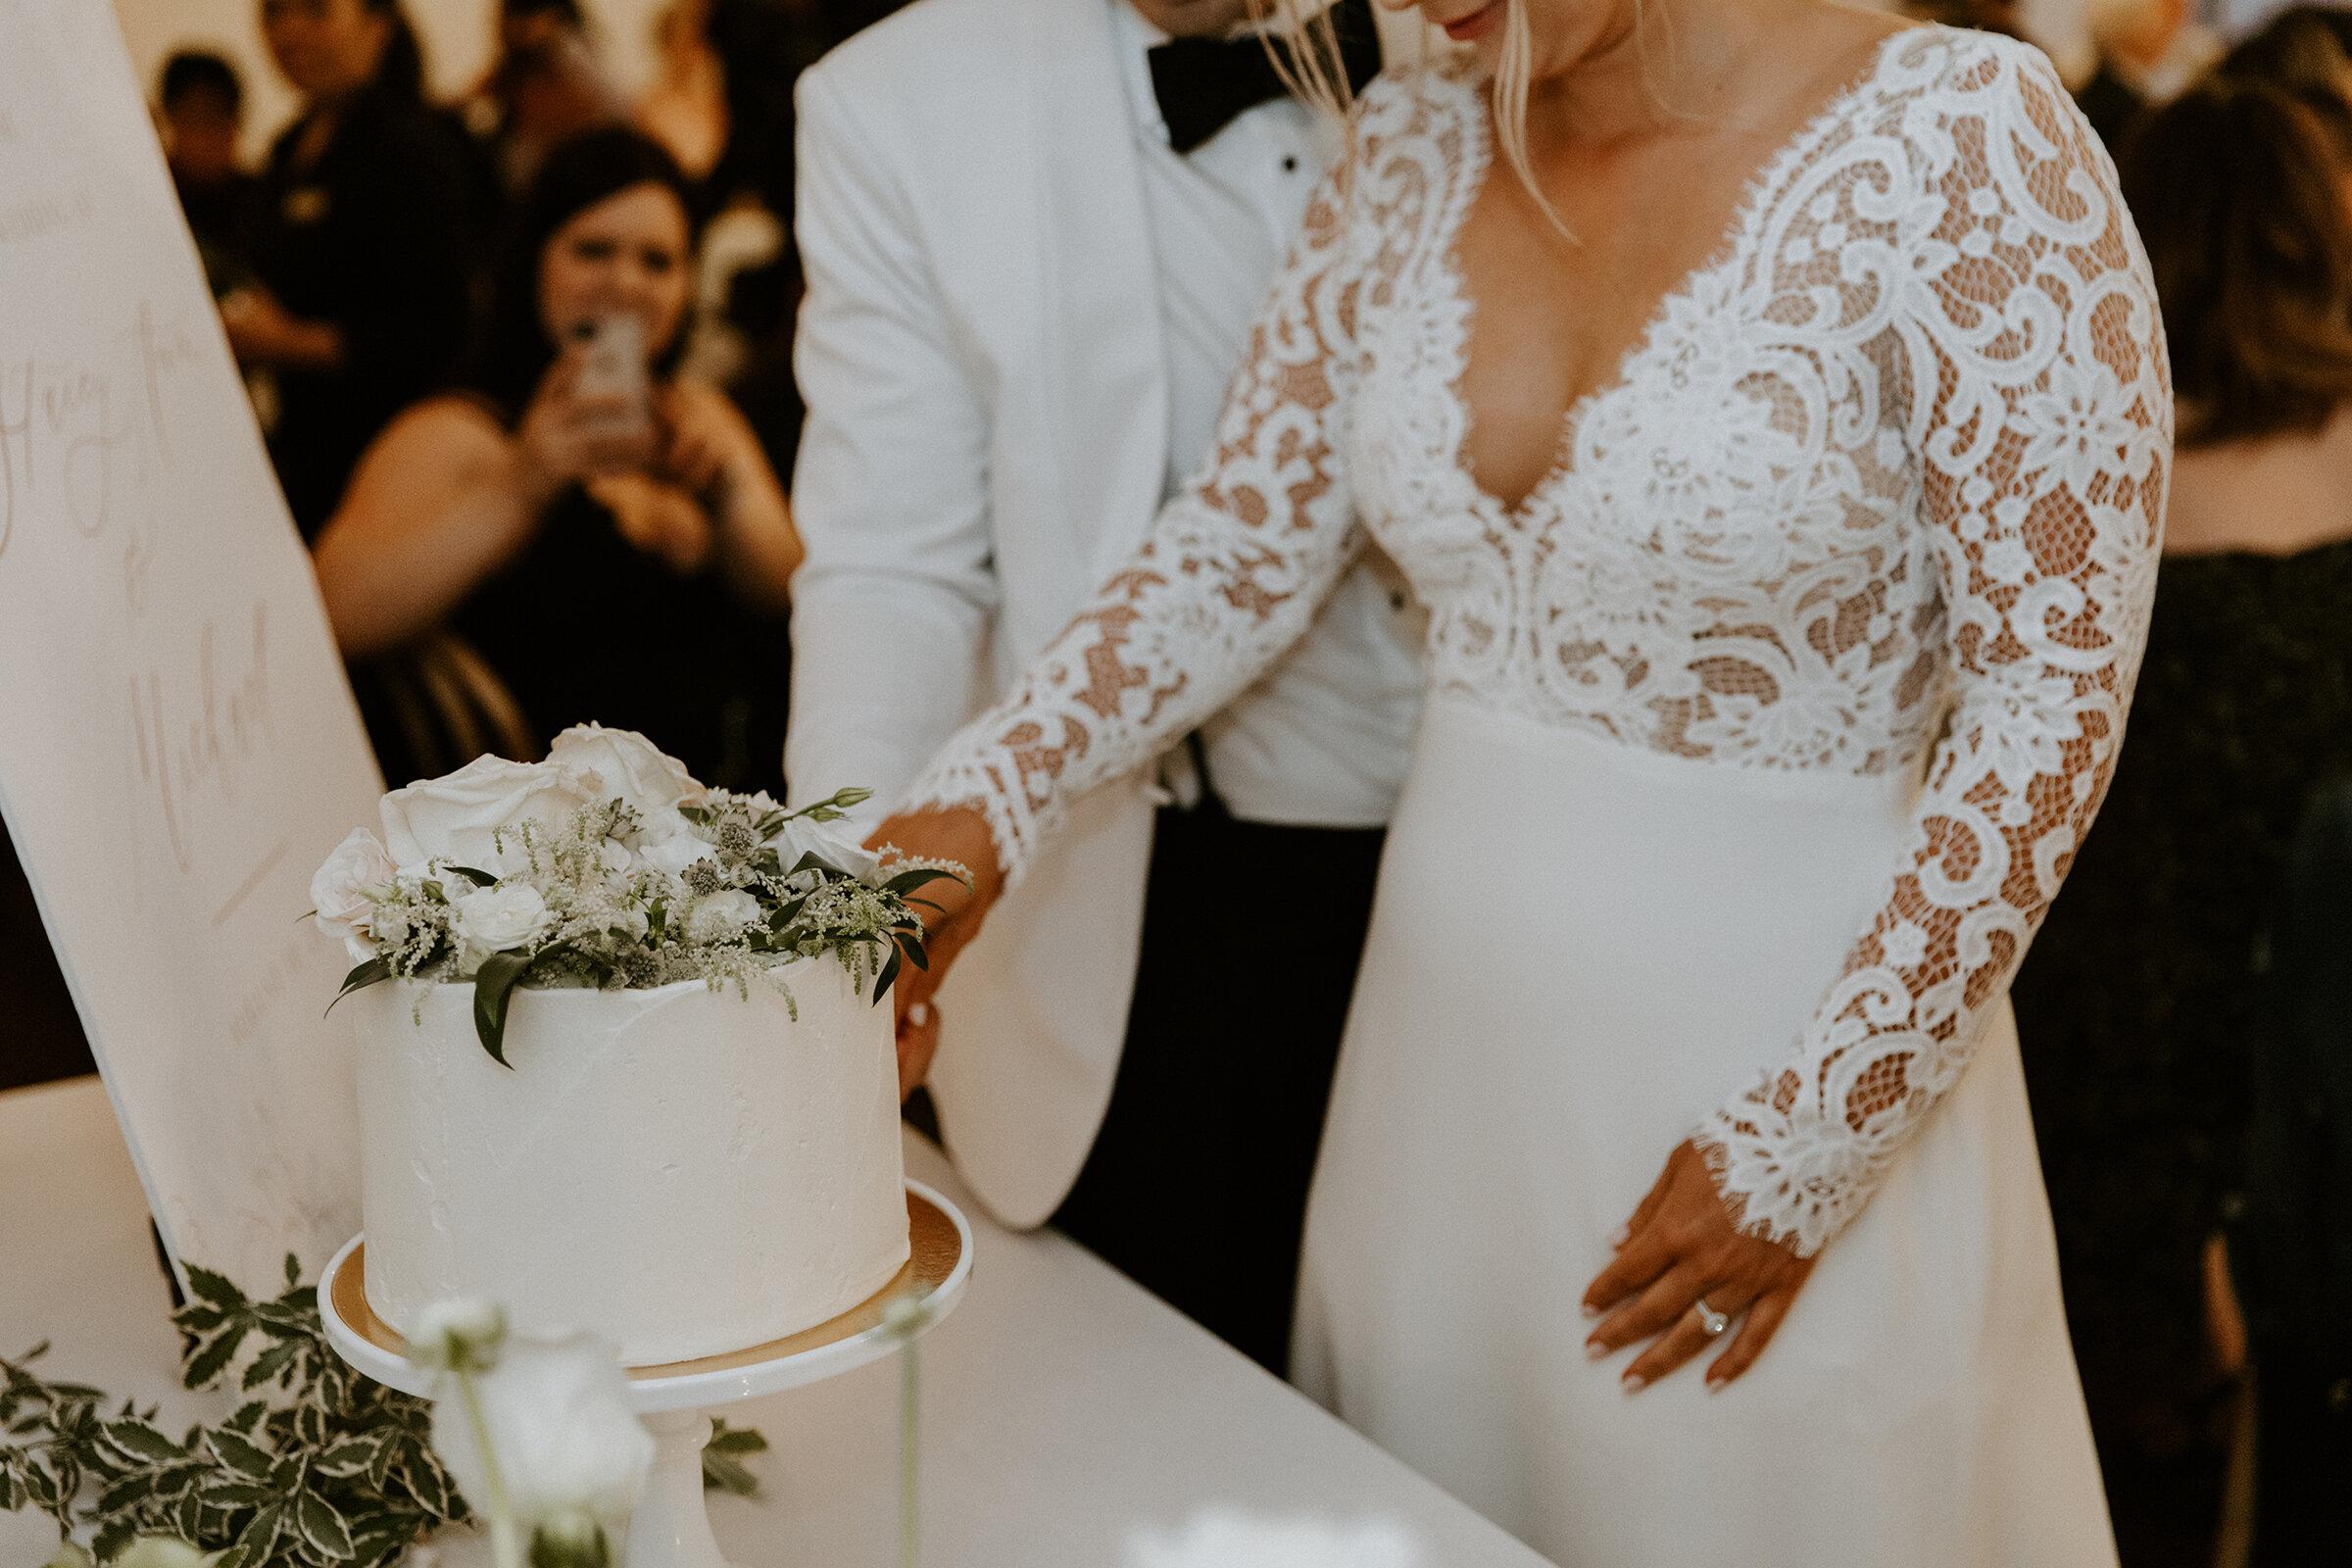 Wedding Reception - Tablescape & Decor Inspiration